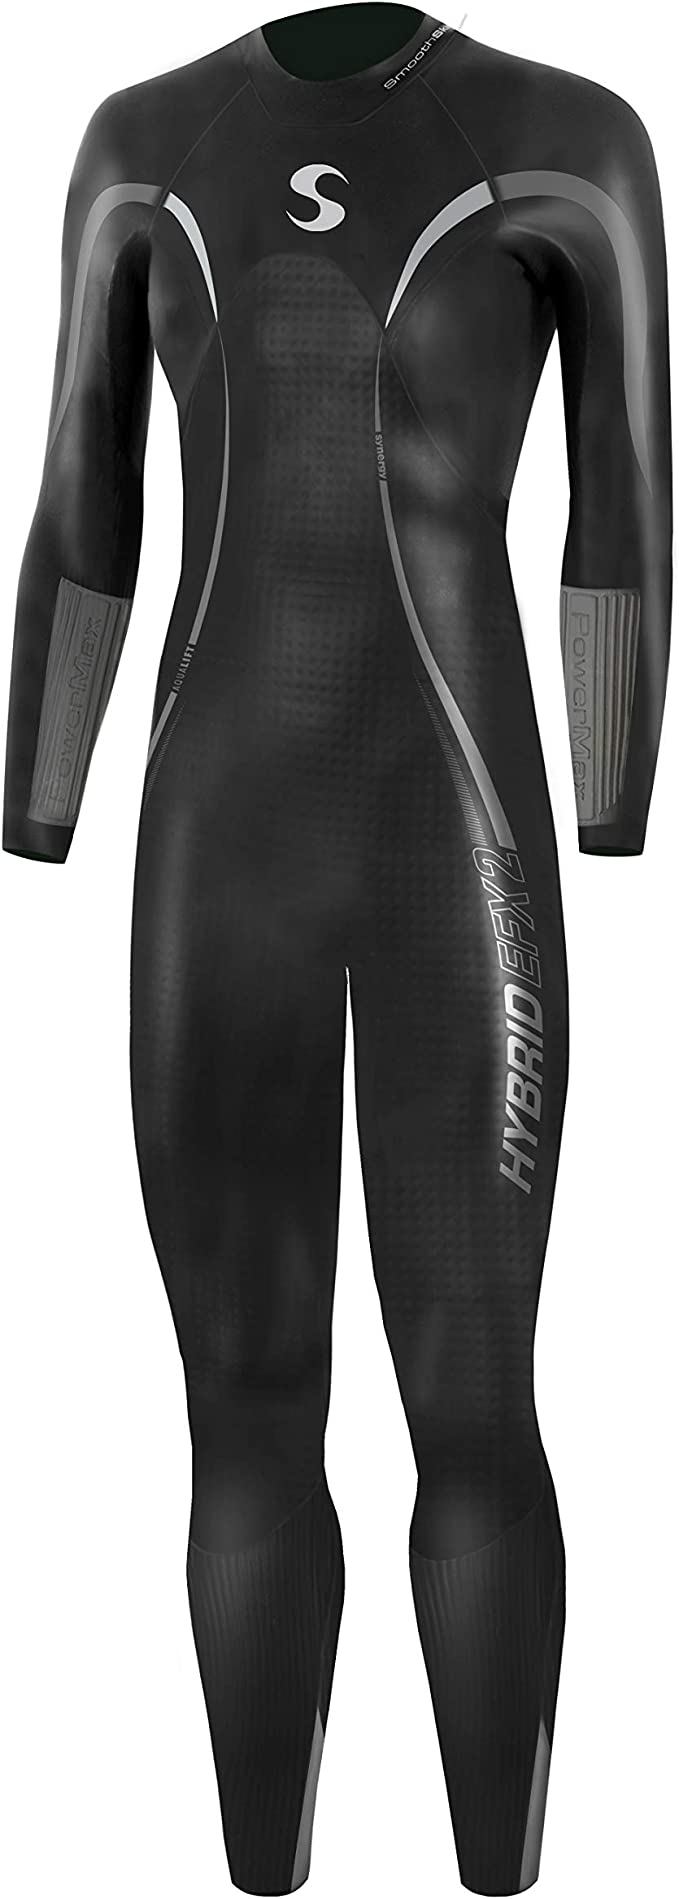 Amazon.com: Triathlon Wetsuit – Synergy Mujer híbrida ...